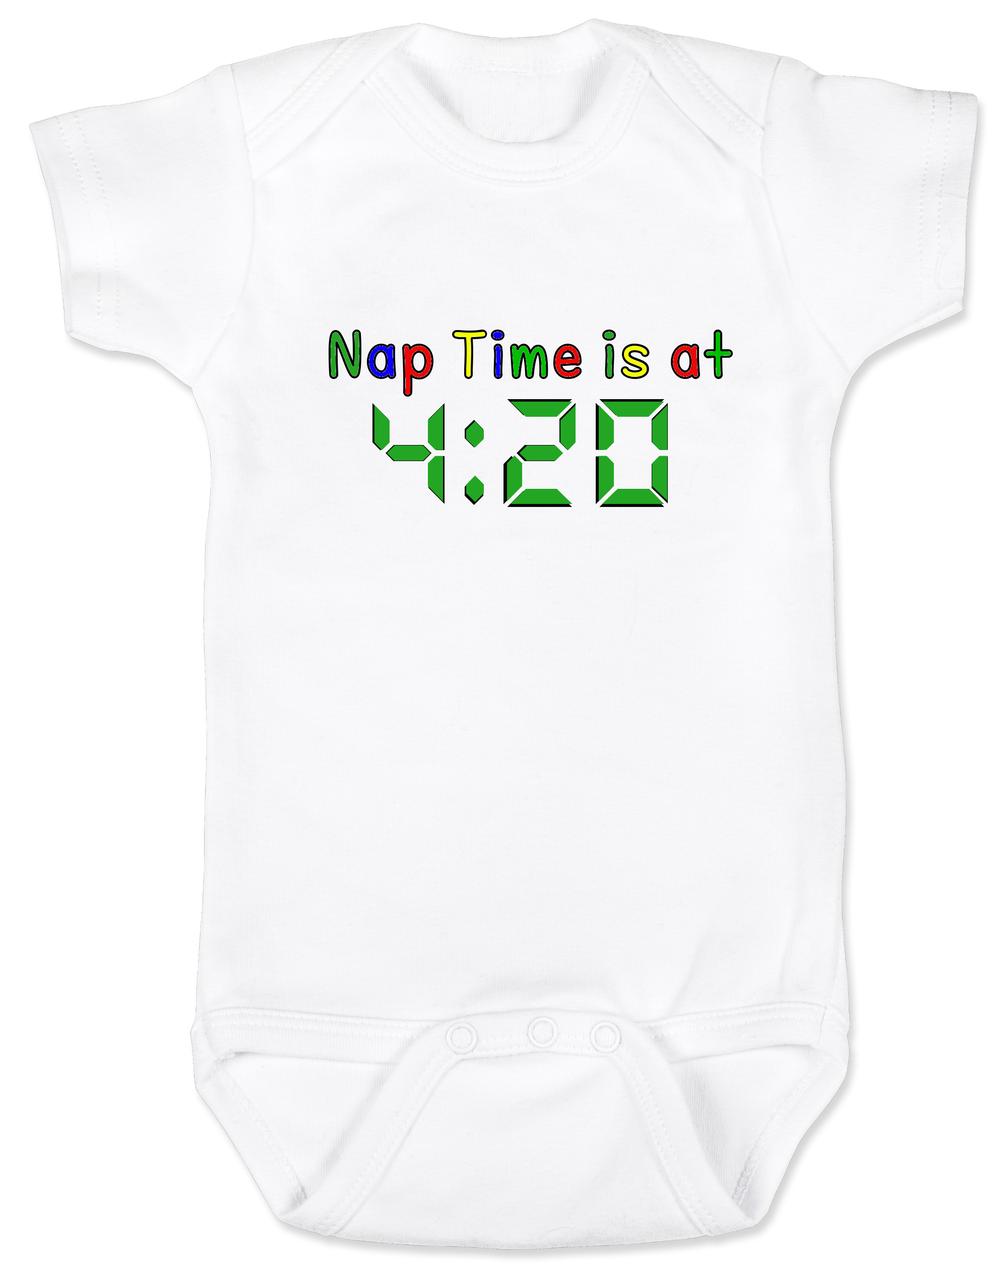 Baby Shower Gift Baby Onesie Funny Onesie NOPE Not Napping Today Onesie